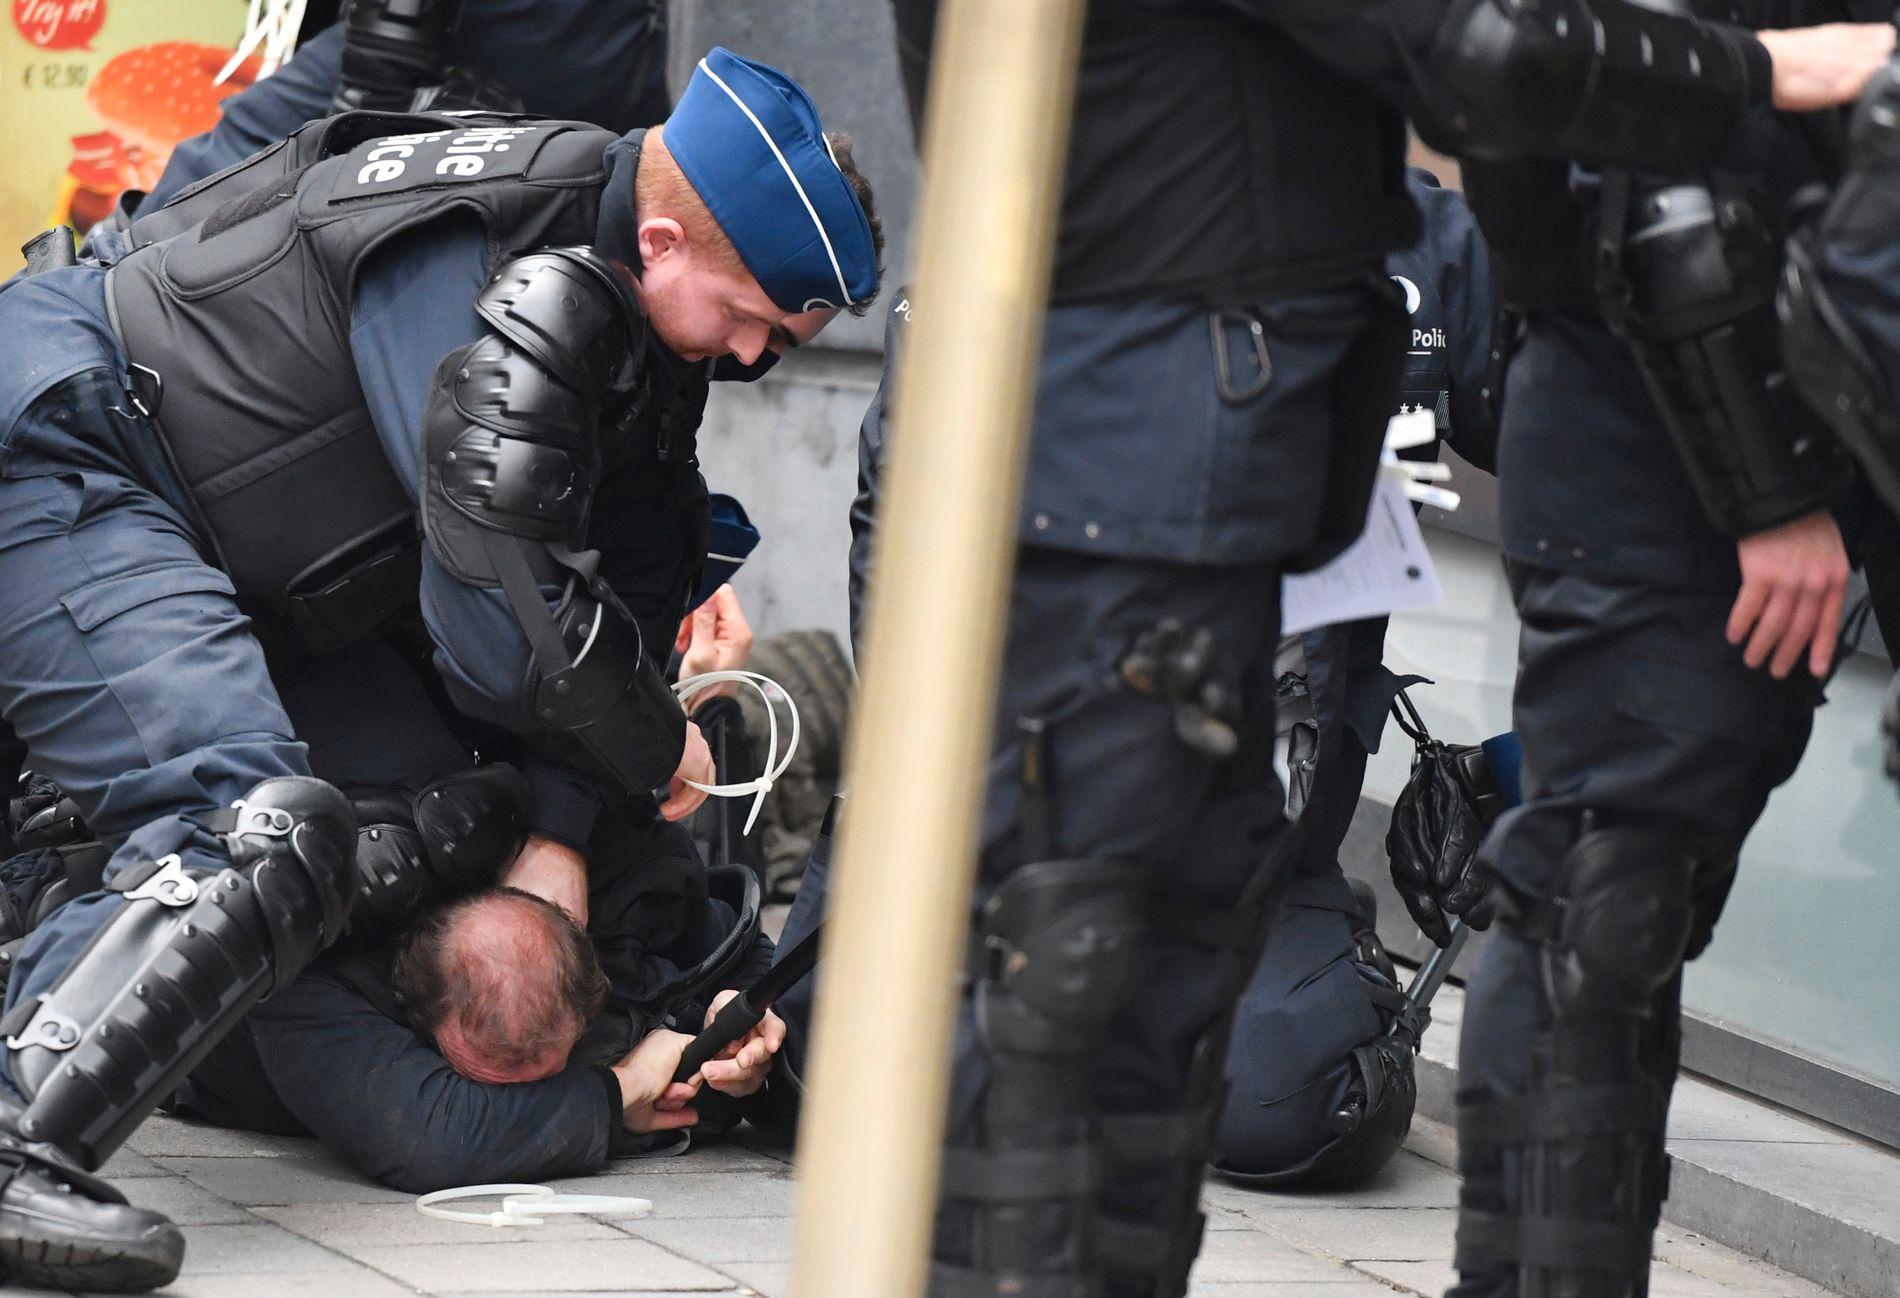 Belgisk politi pågriper demonstranter ved EU-kvartalet i Brussel lørdag. Foto: AP / NTB scanpix.